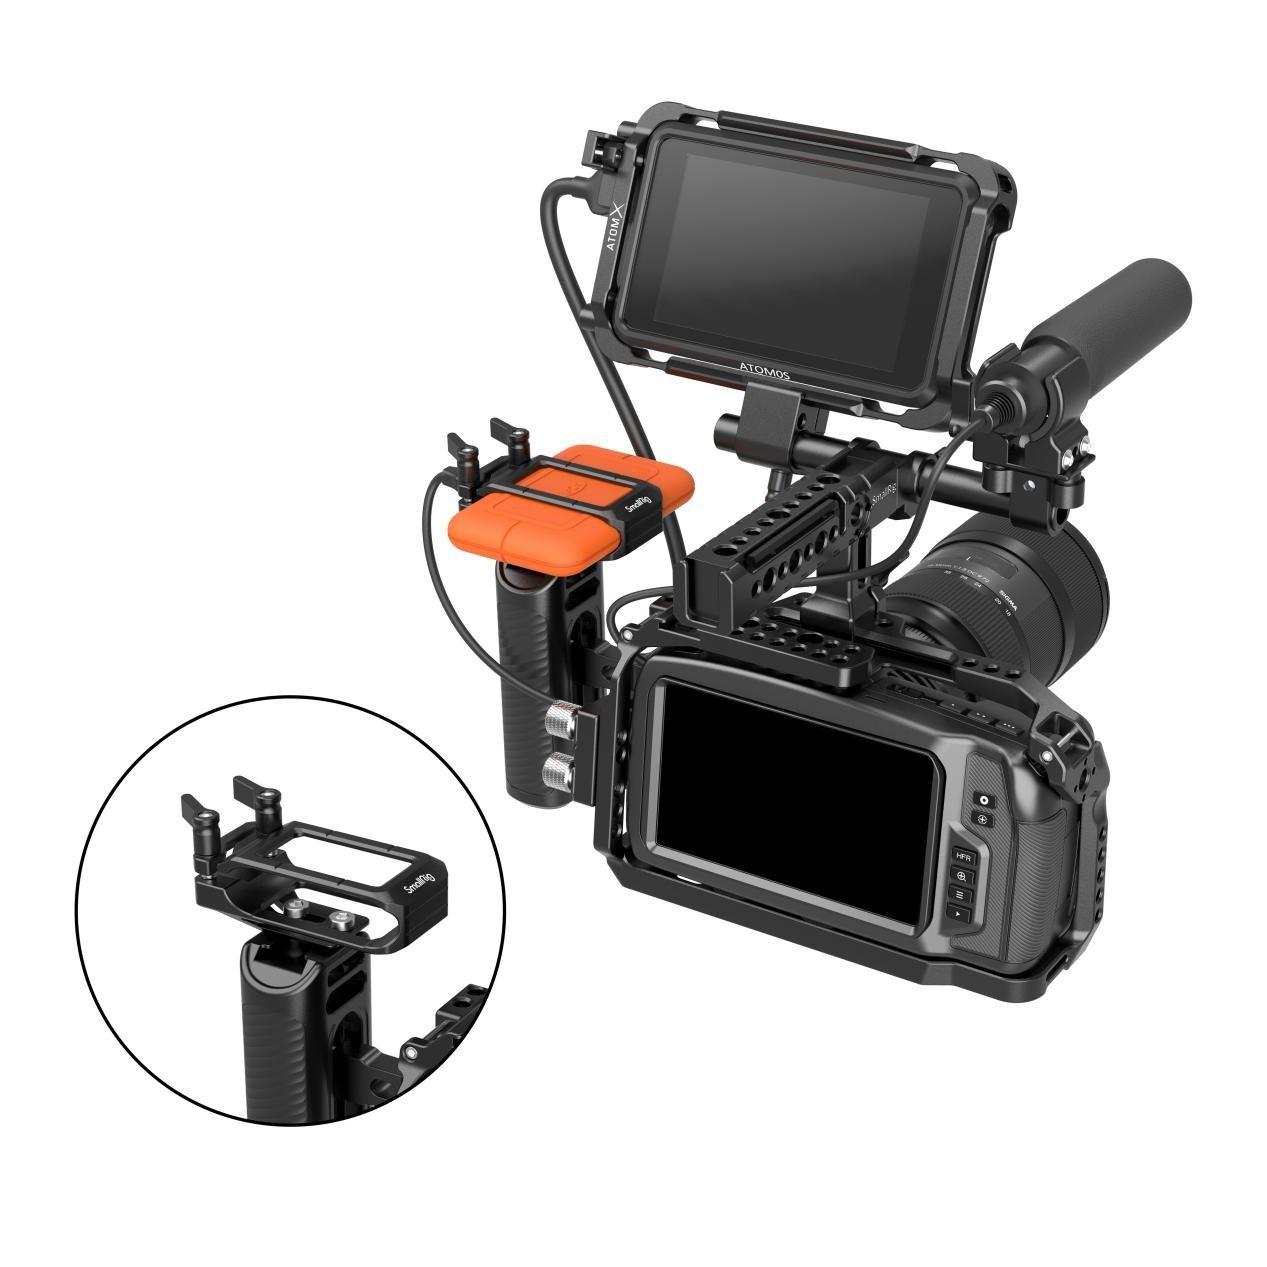 Smallrig Ssd Holder For Lacie Rugged Ssd Maximize The Blackmagic Pocket Cinema Camera 4k 6k Workflow